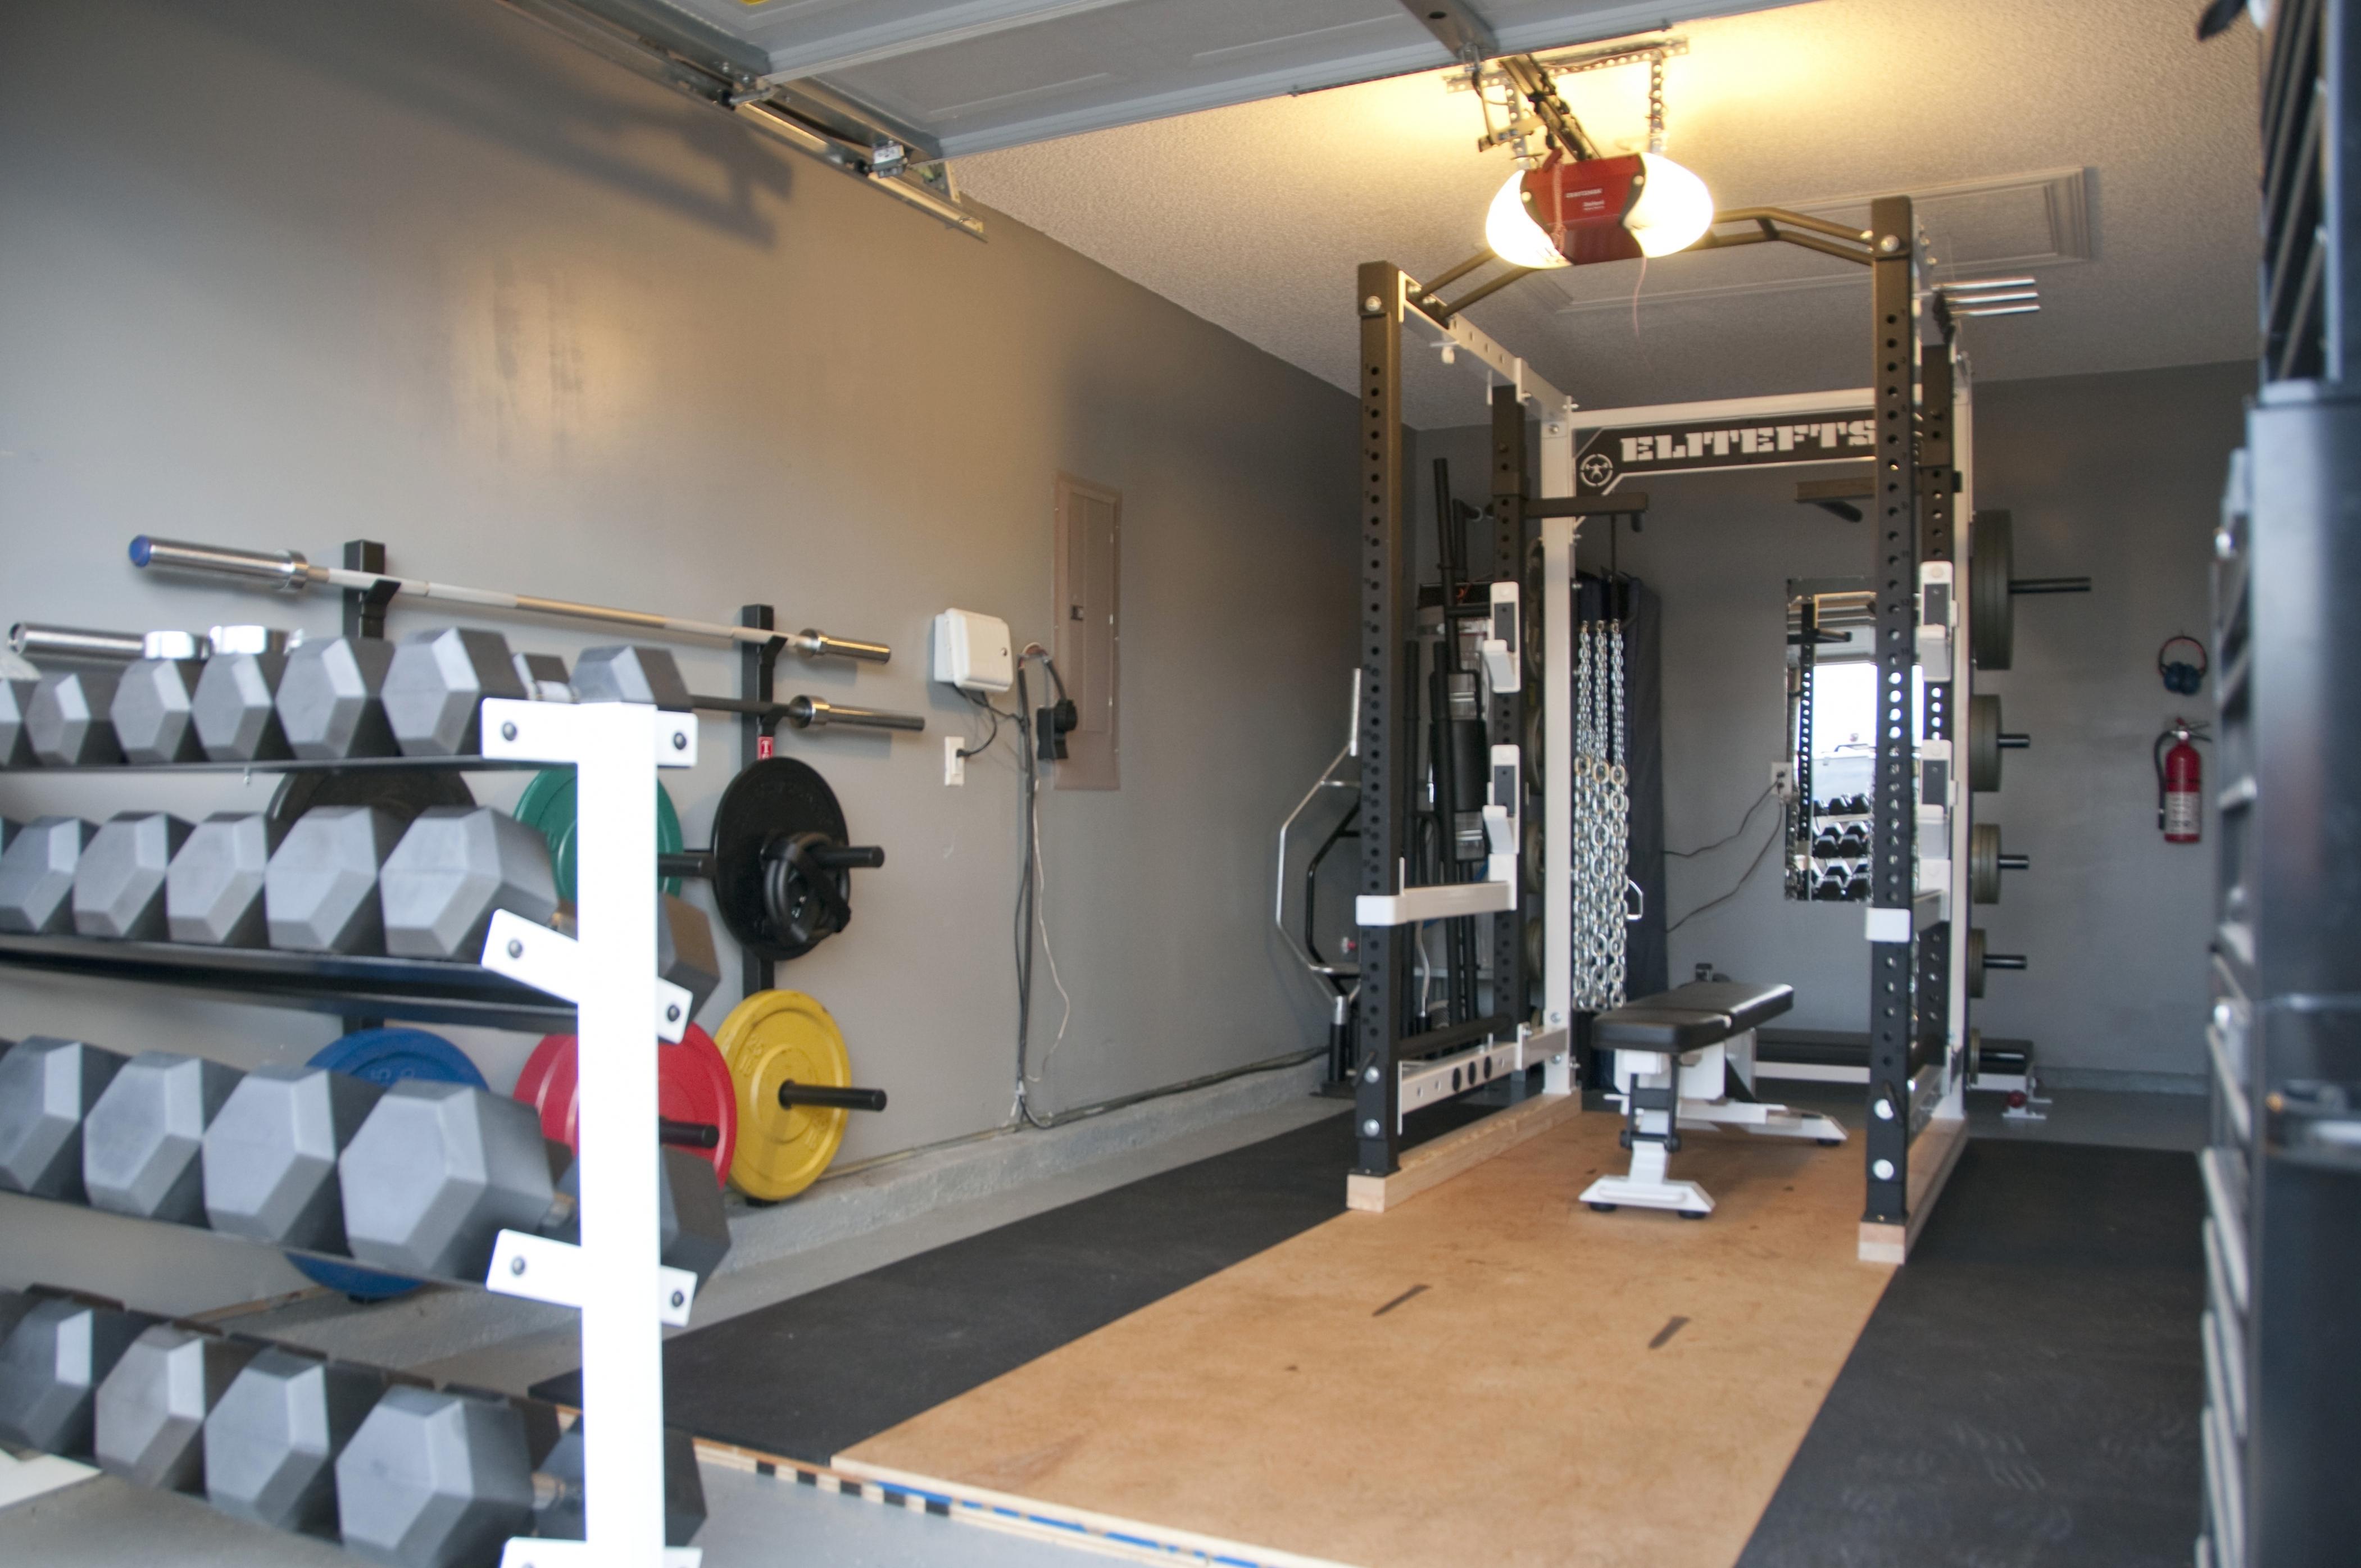 Storage garage gym ideas : rickyhil outdoor ideas very useful